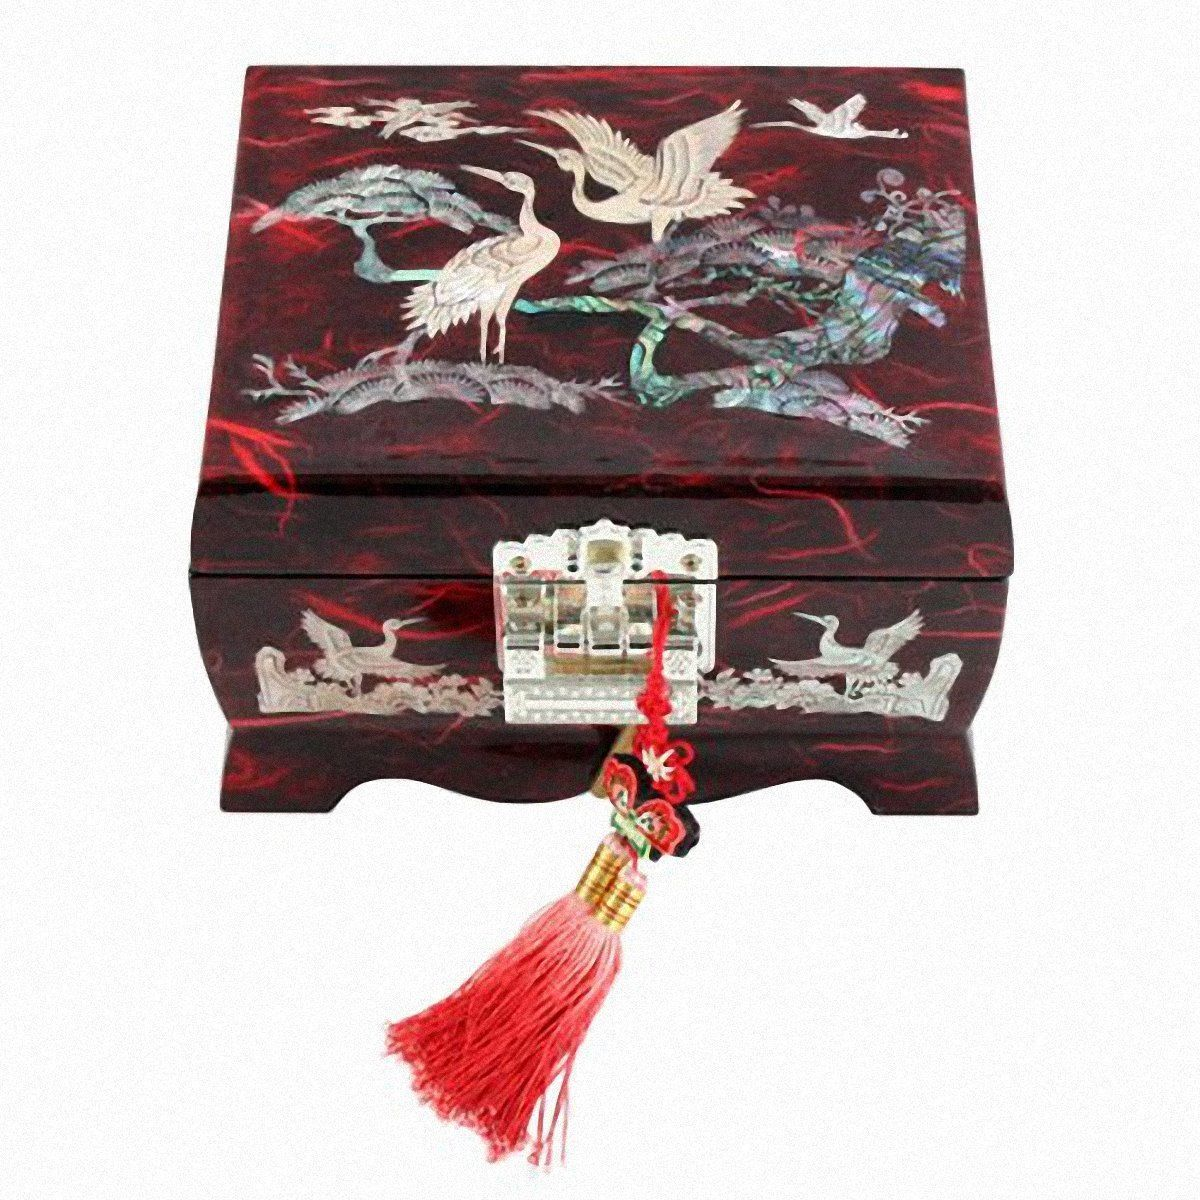 Jewelry Box Wood Jewel Case Organizer Ring Music Chest Box  Crane 5 Colors(B)